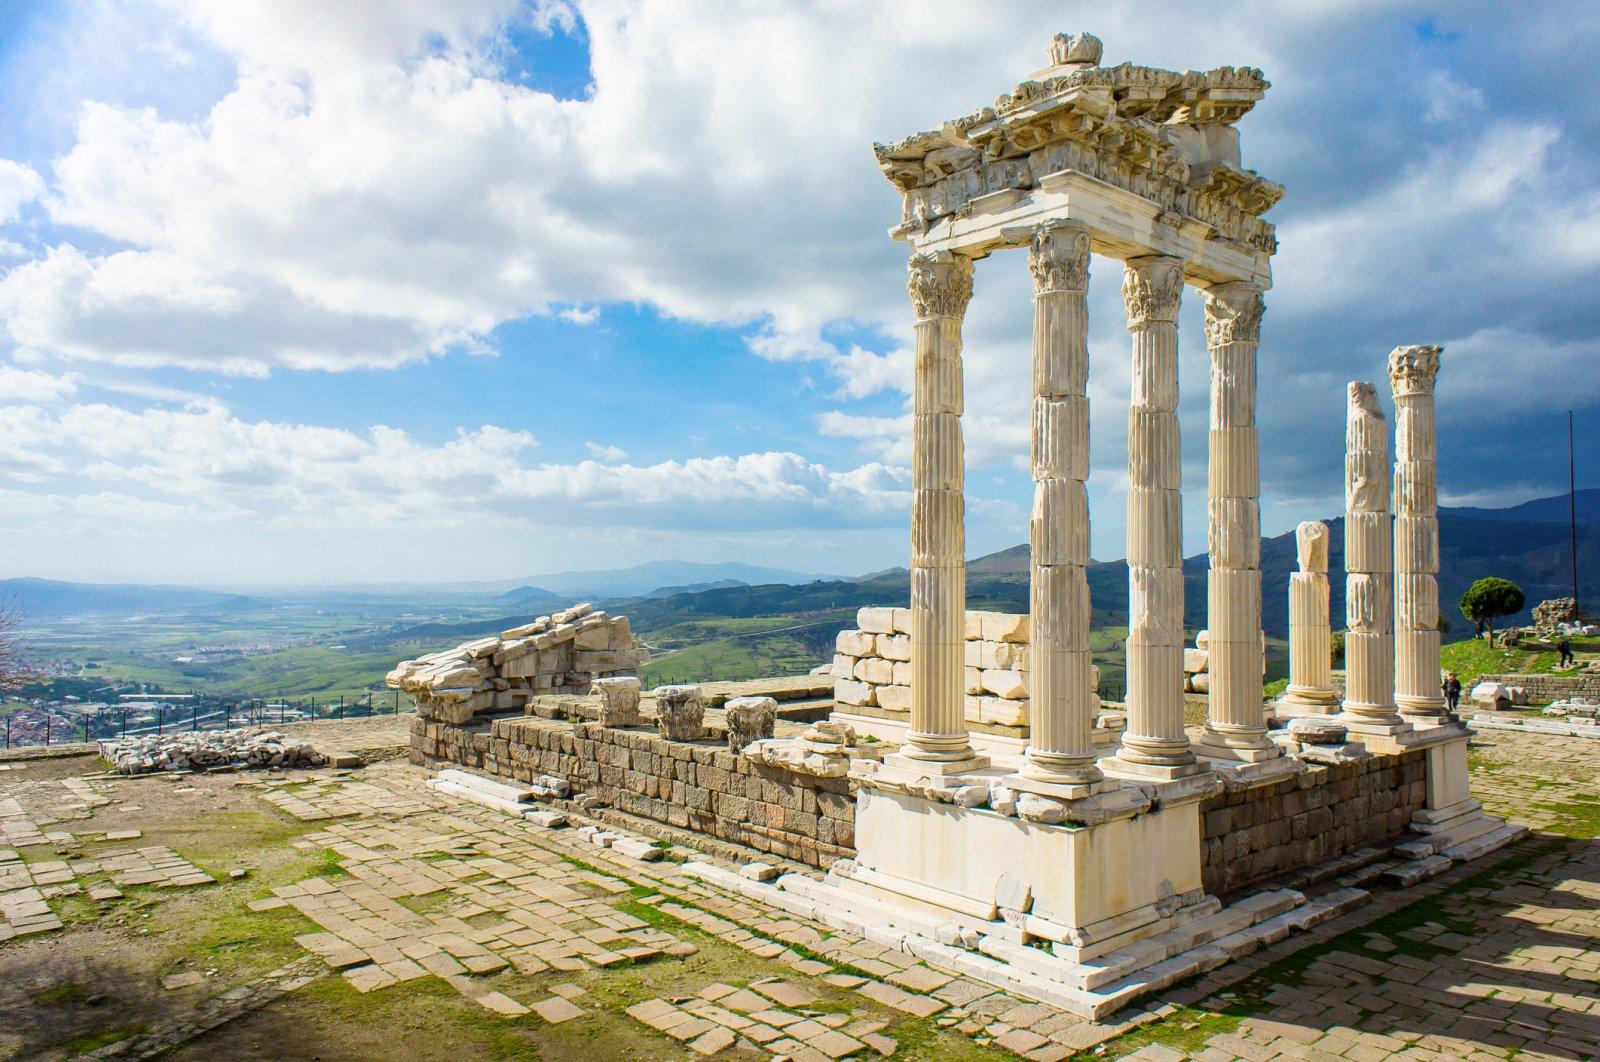 The temple of Trajan in the ancient city of Pergamon, Bergama, Turkey. (iStock Photo)